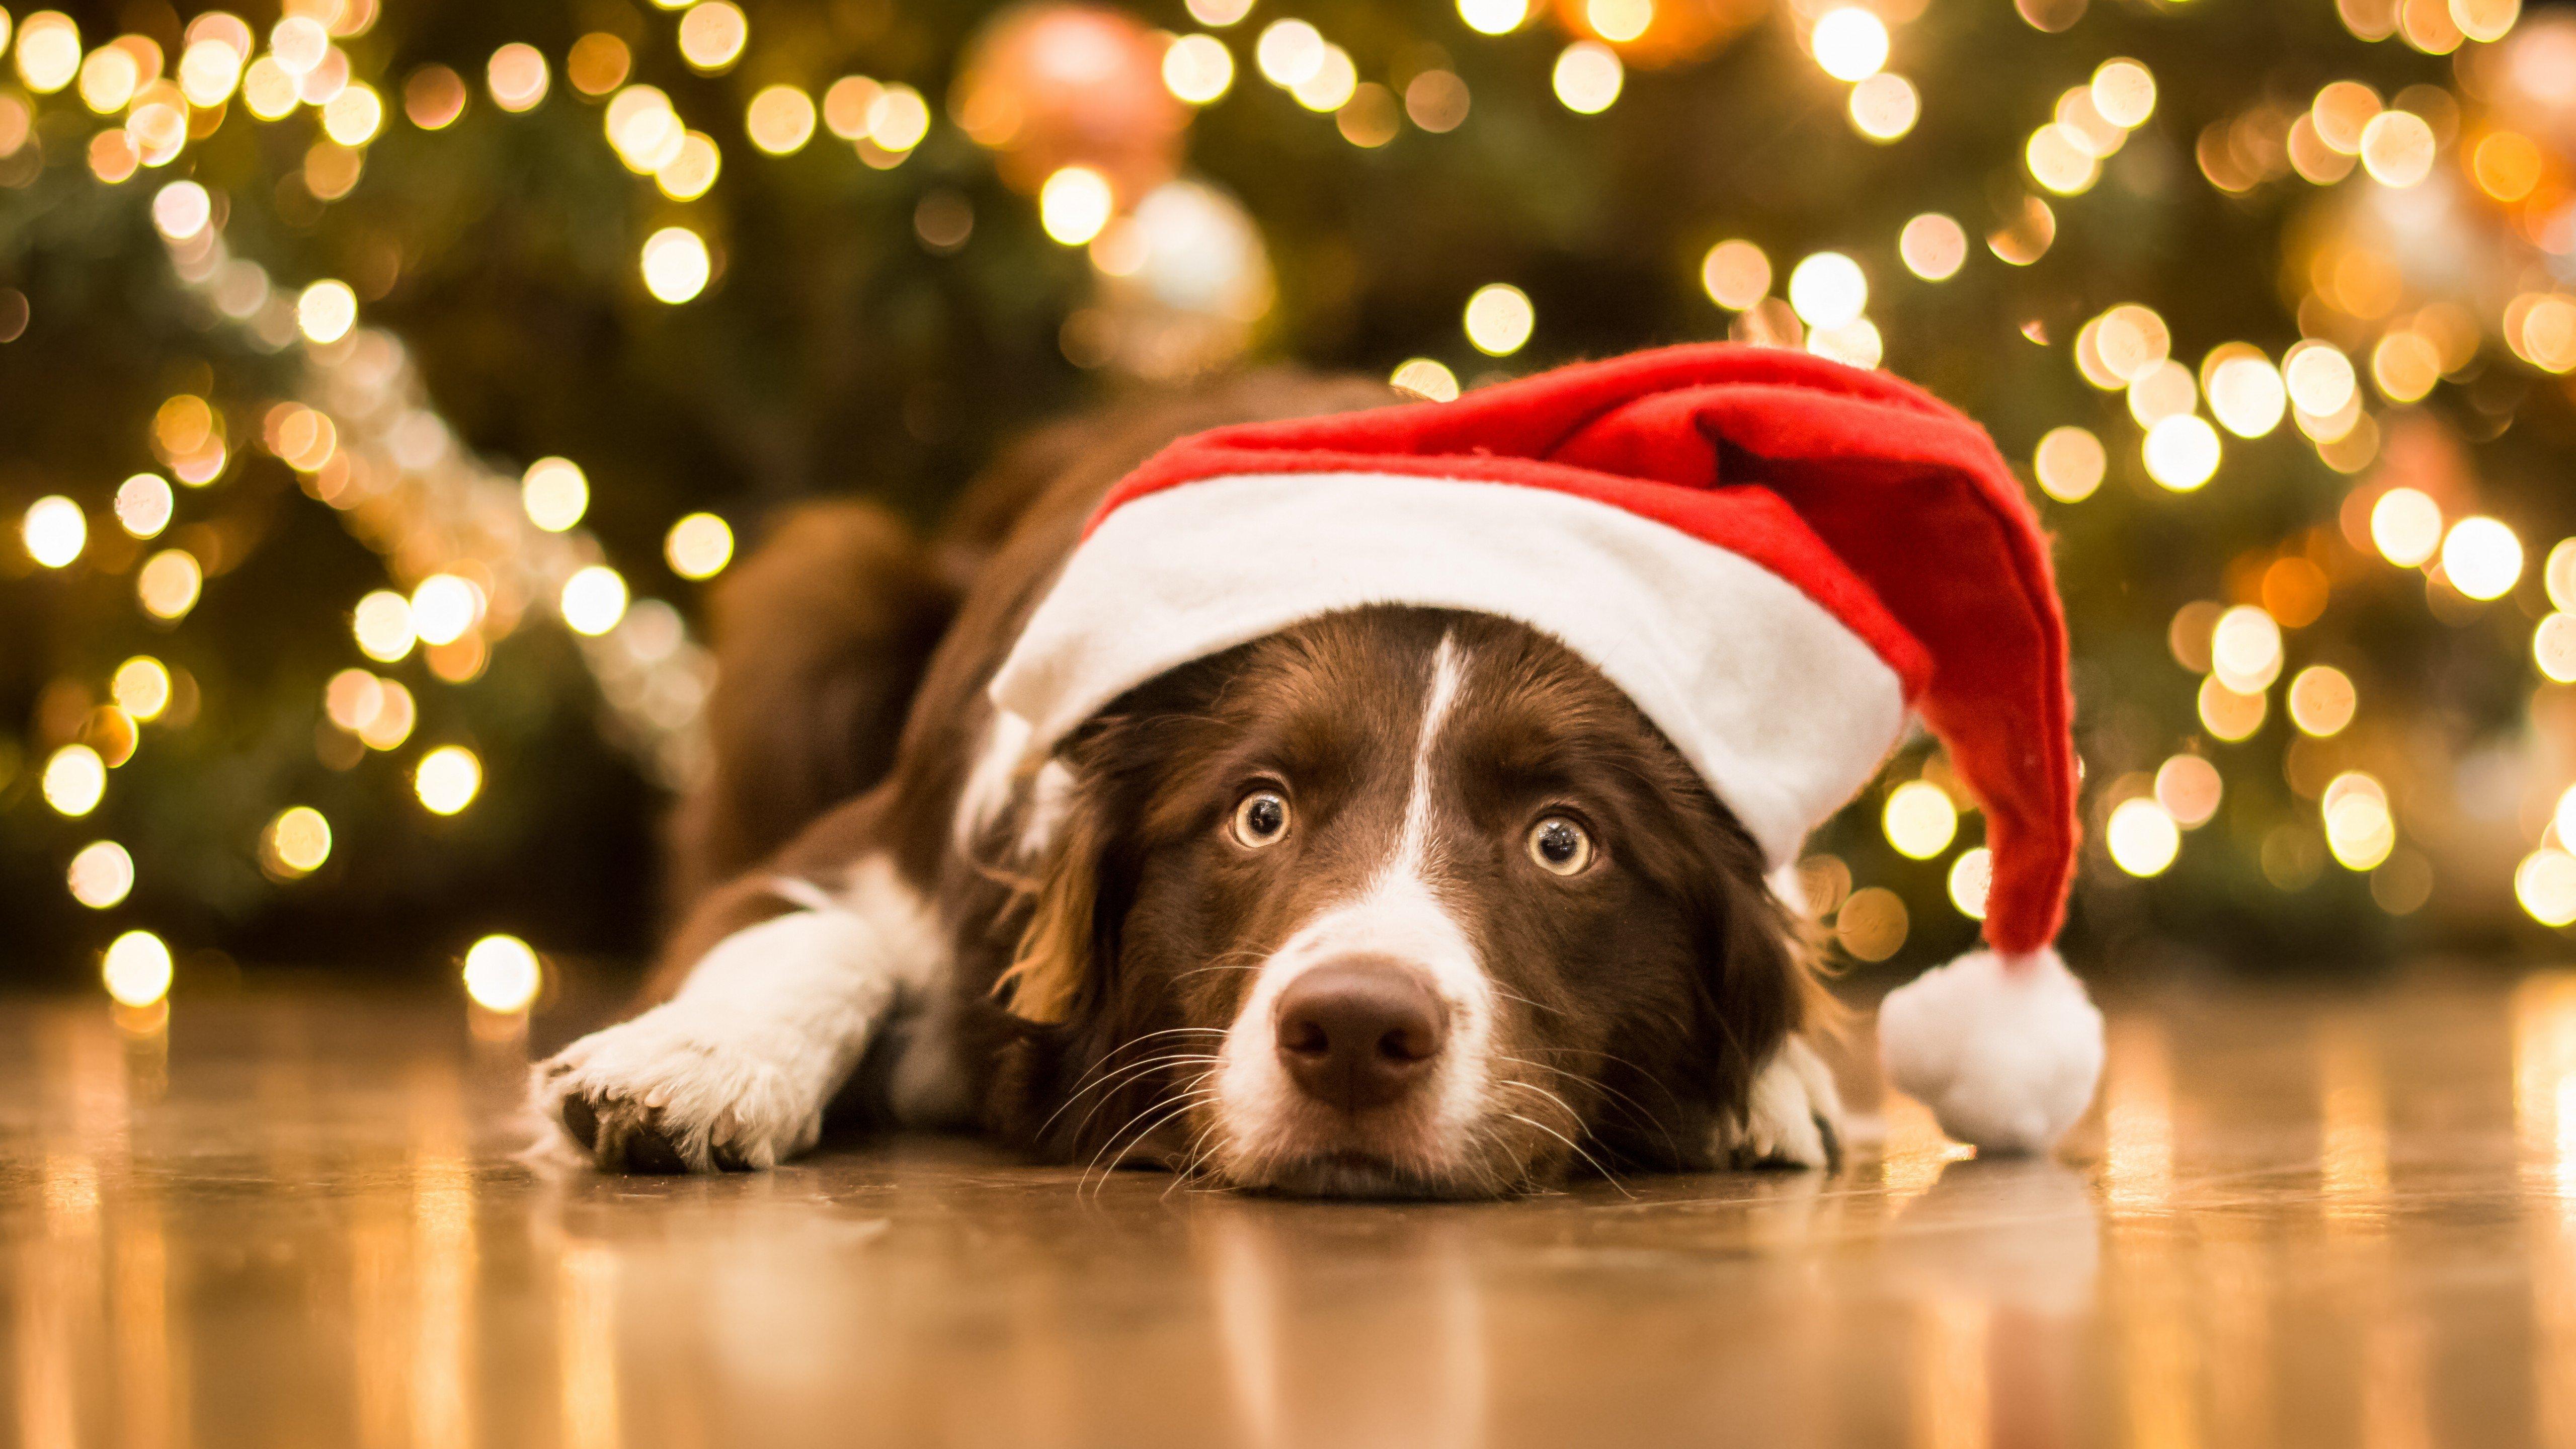 Wallpaper Dog with Santa Claus hat